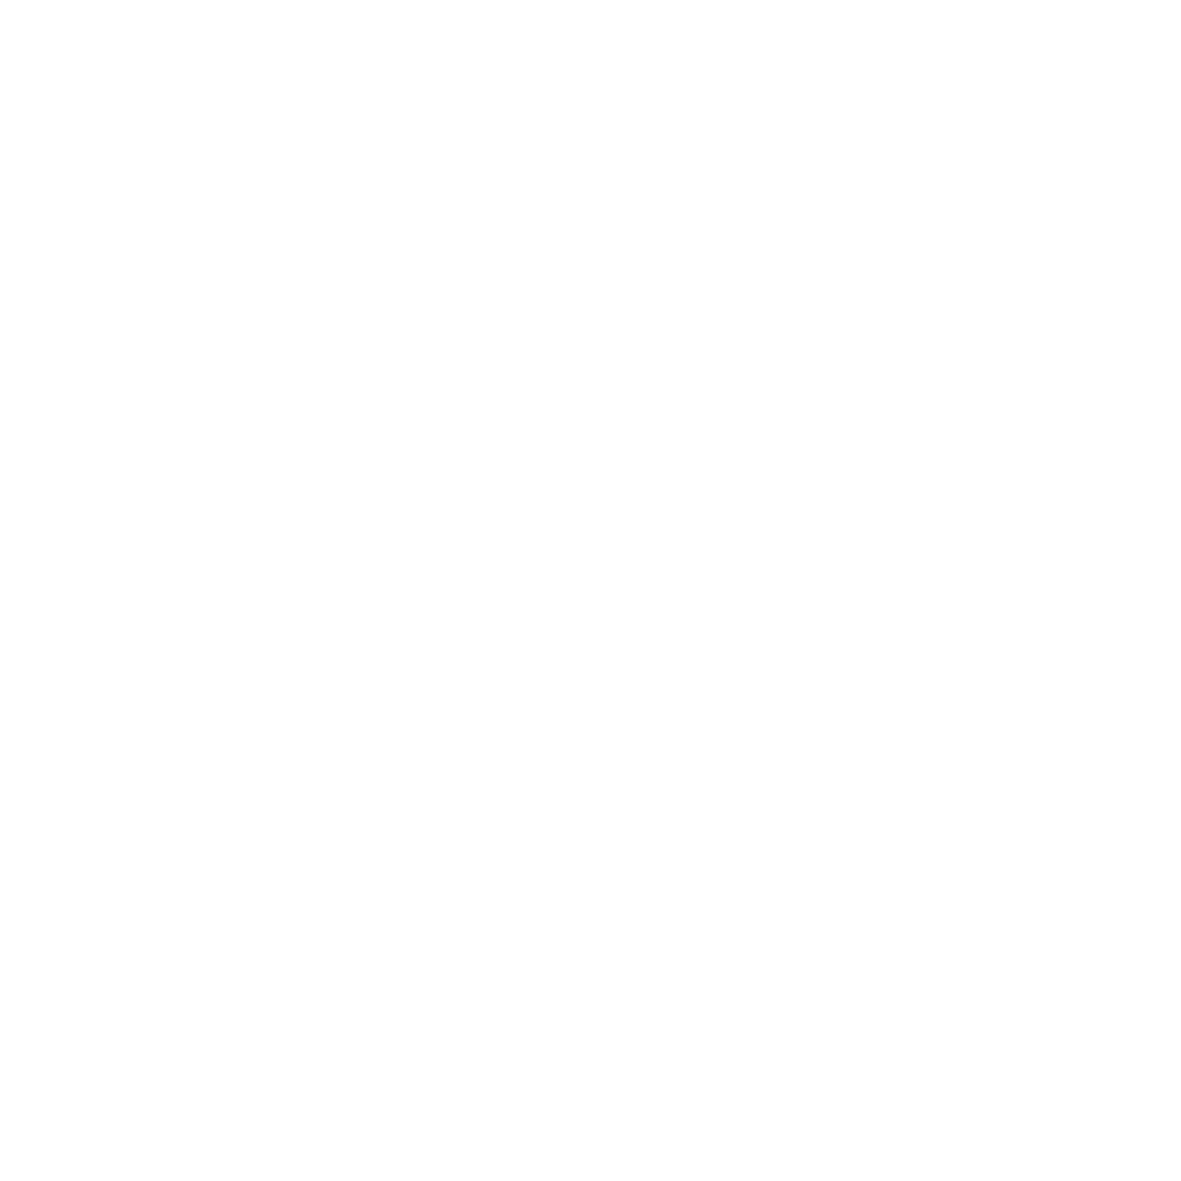 Jet ski rental Dubrovnik